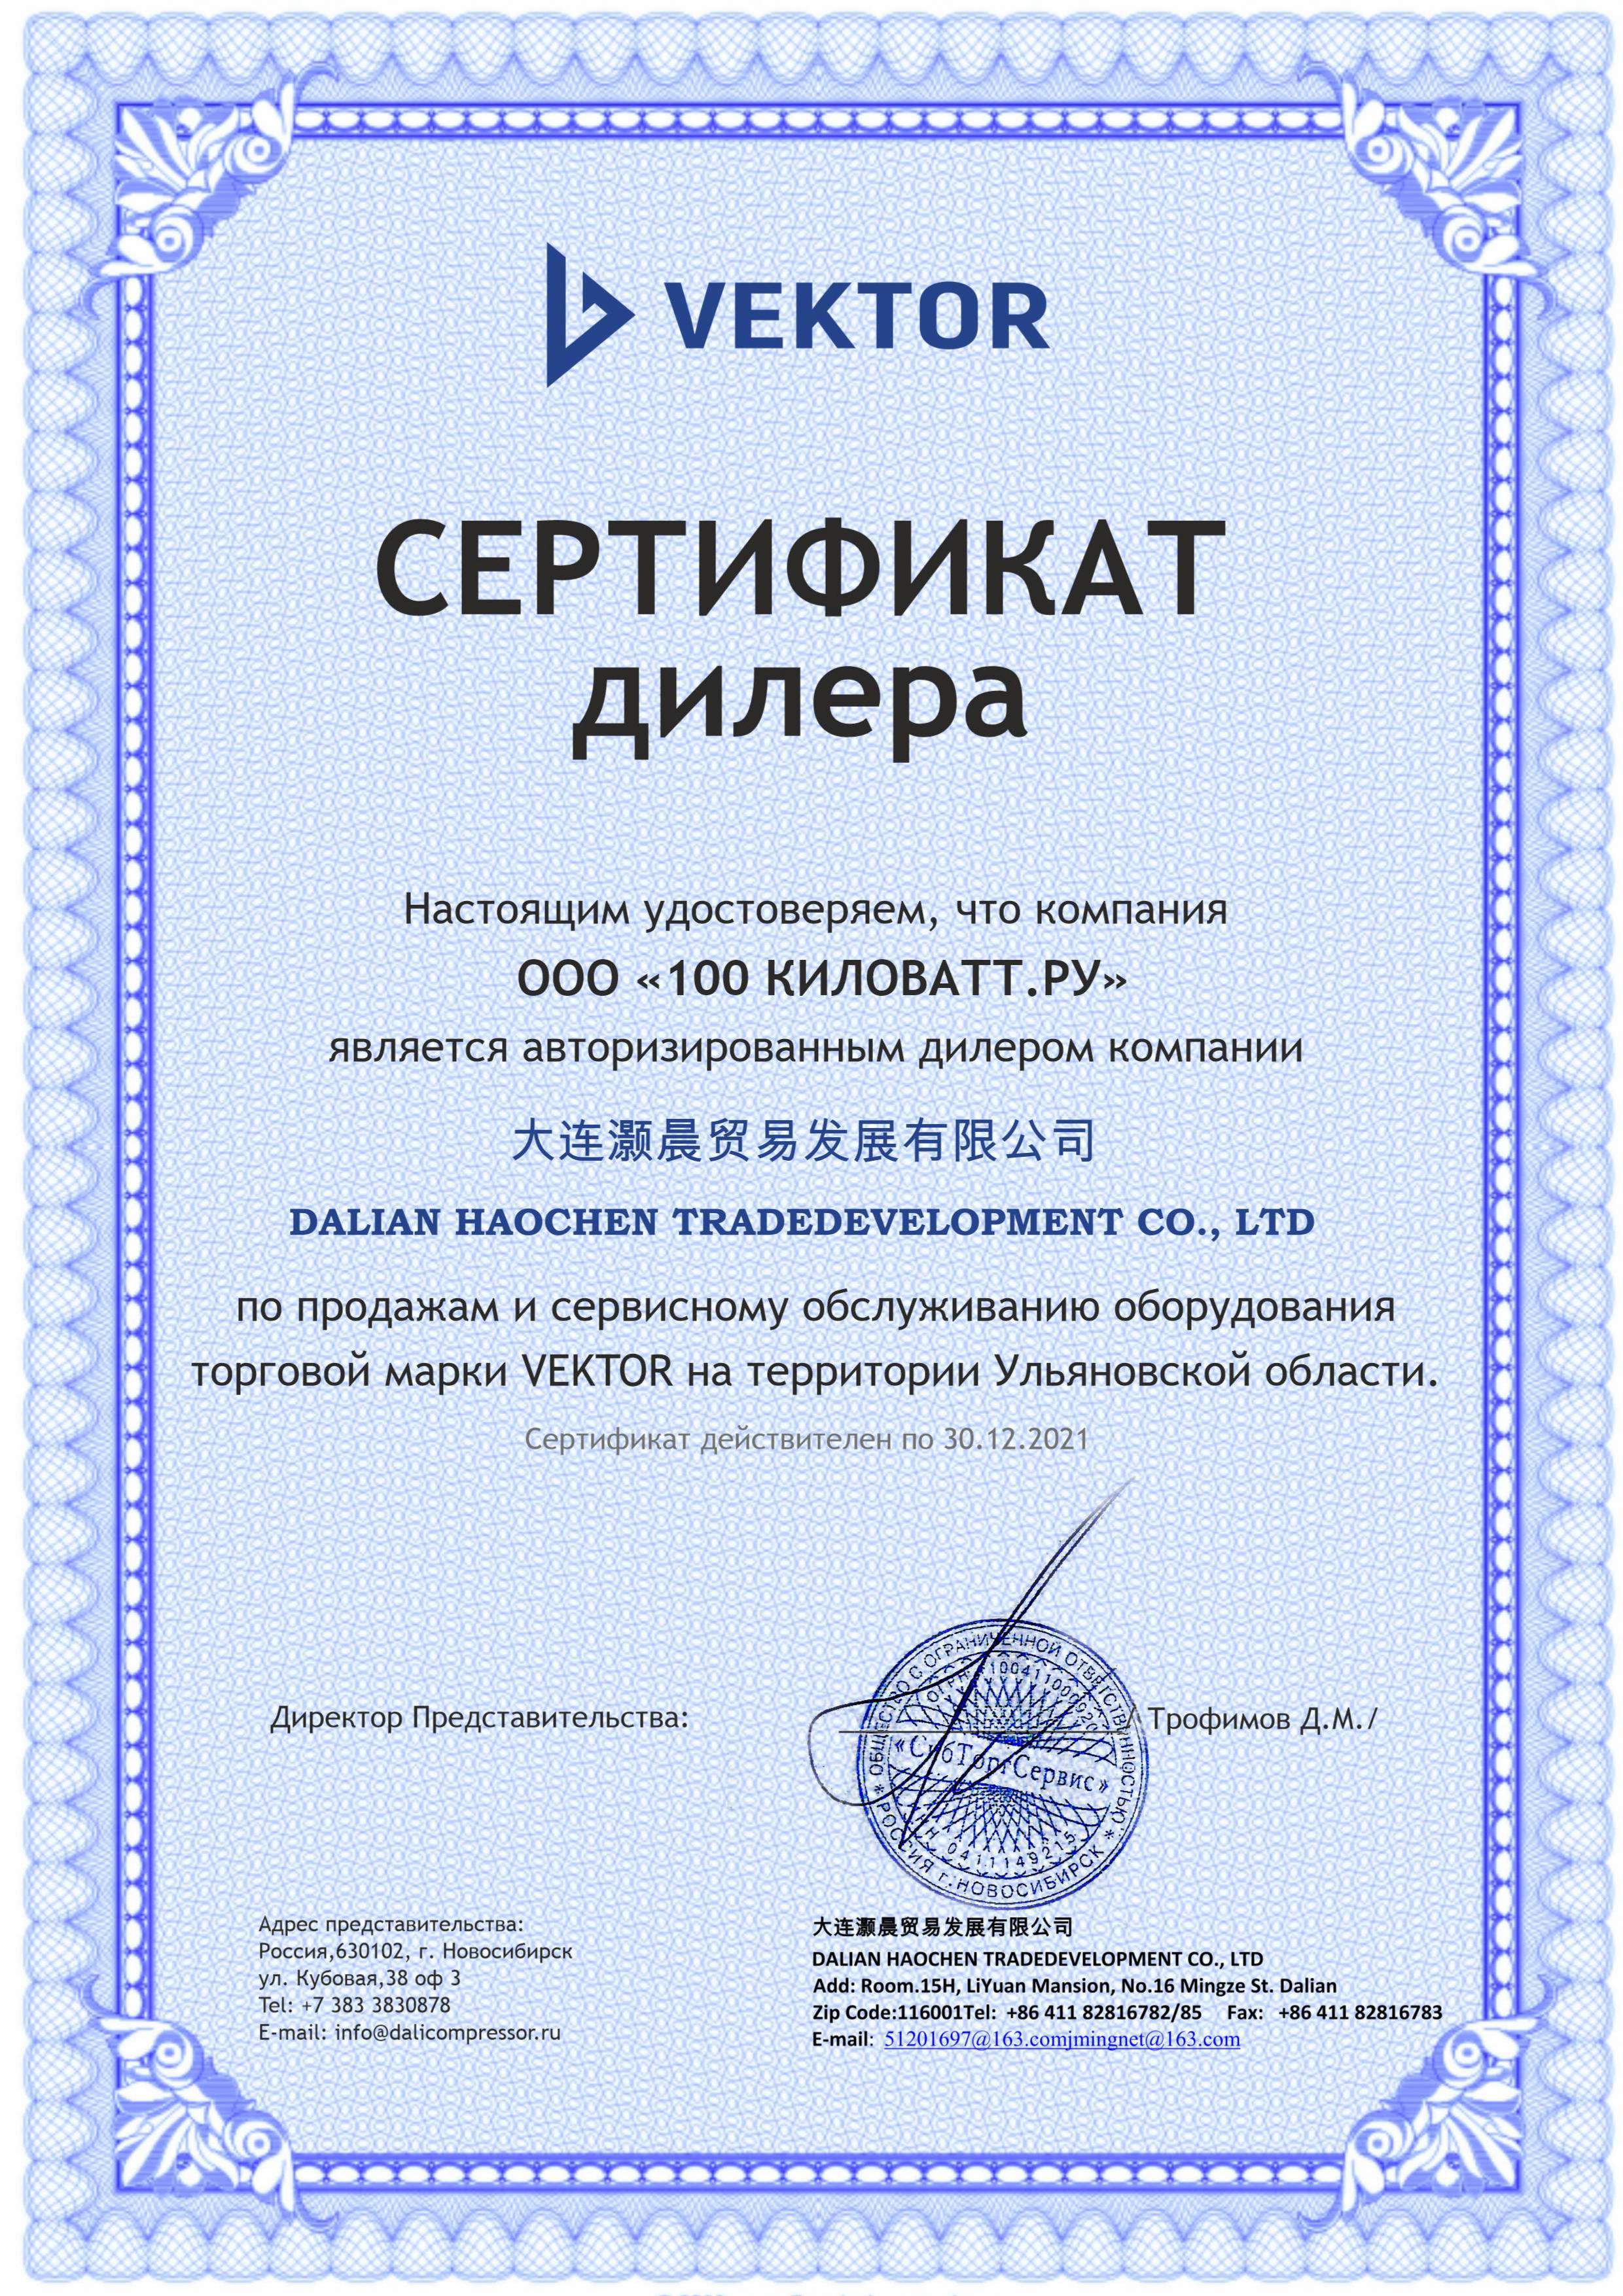 VEKTOR - Сертификат дилера